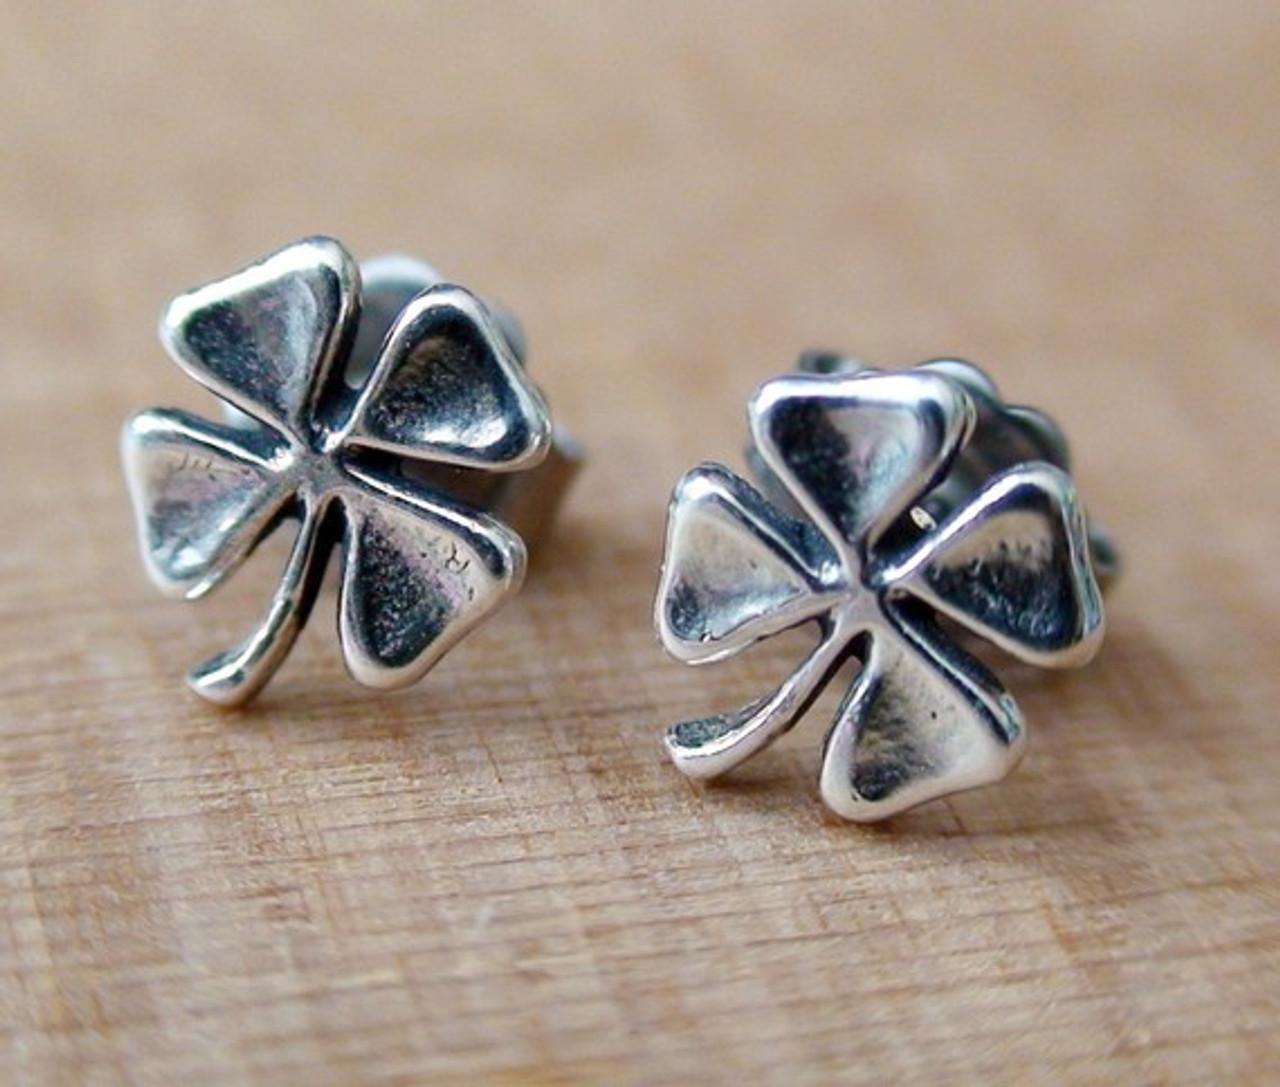 2b55fb836 Four Leaf Clover Earrings - Sterling Silver Post Earrings